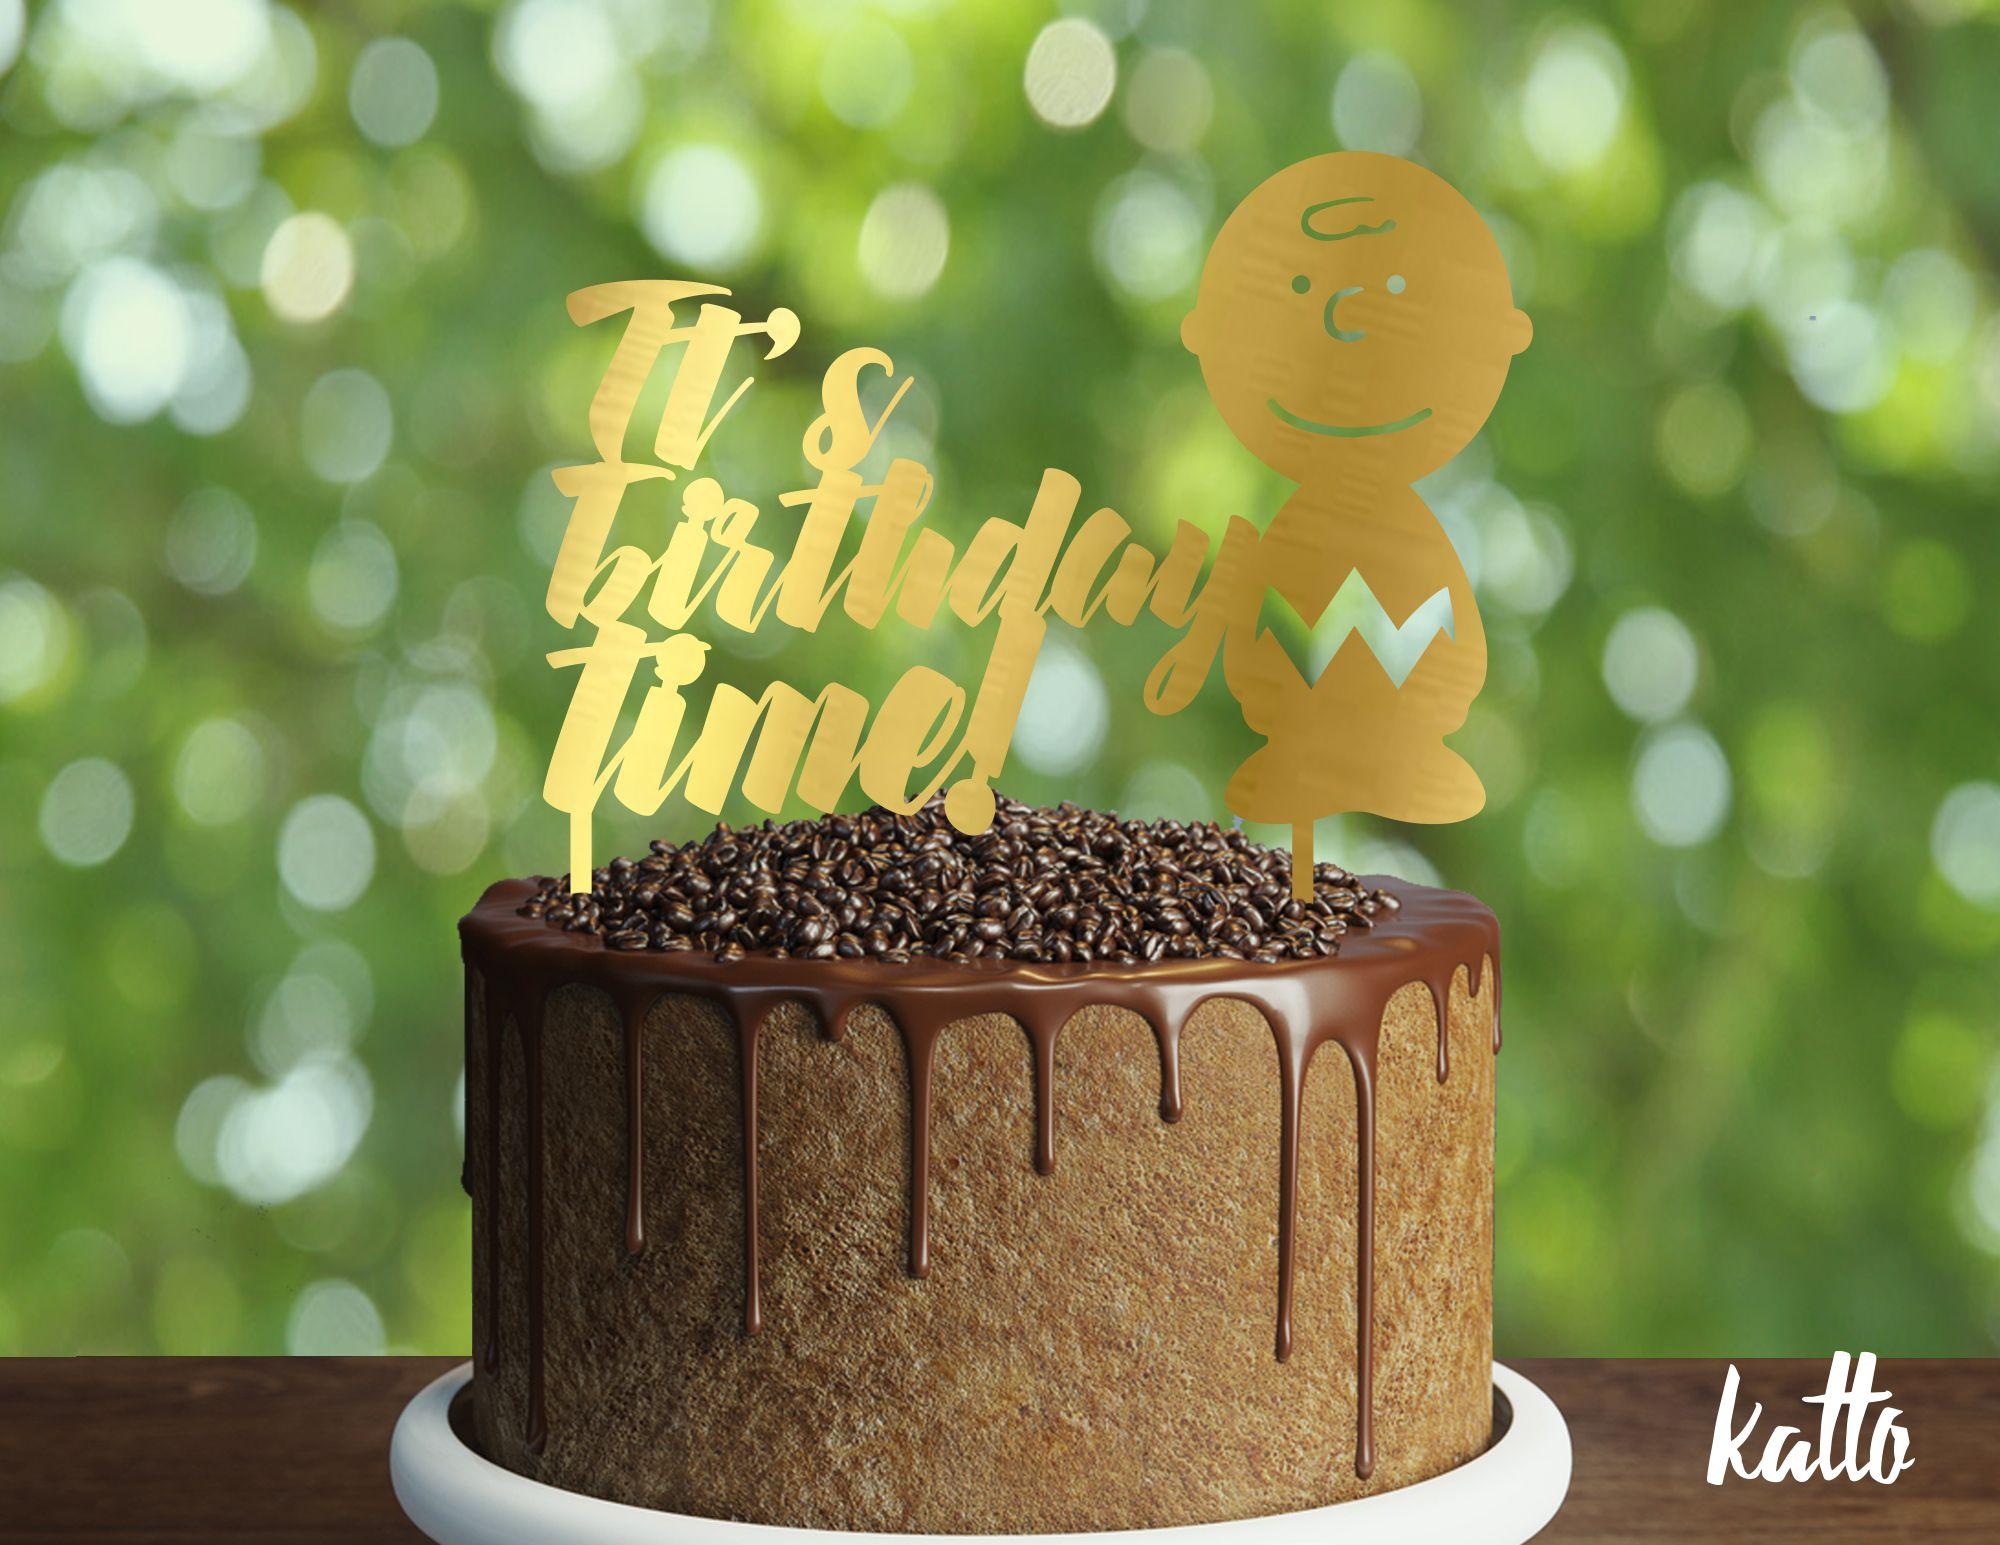 Its birthday time Charlie Brown cake topper Snoopy birthday cake